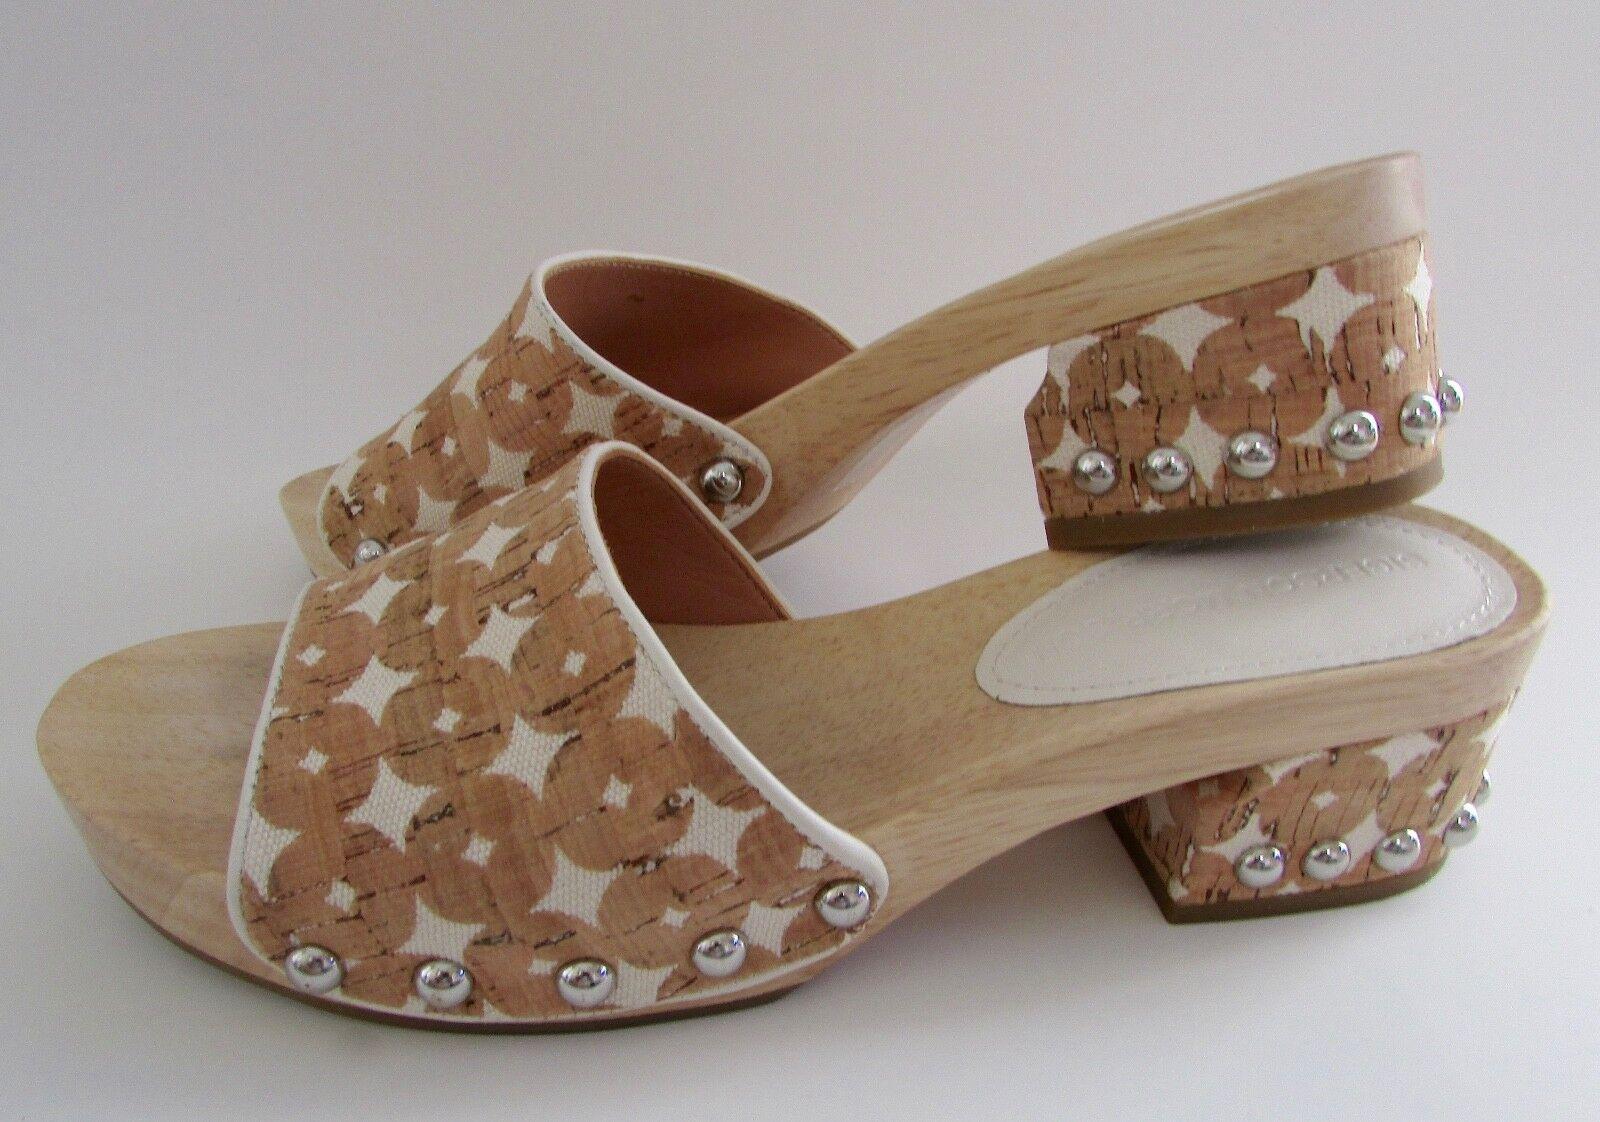 250 Sigerson Morrison AKIRA Wooden Slide Clog Sandals 6.5 EUC